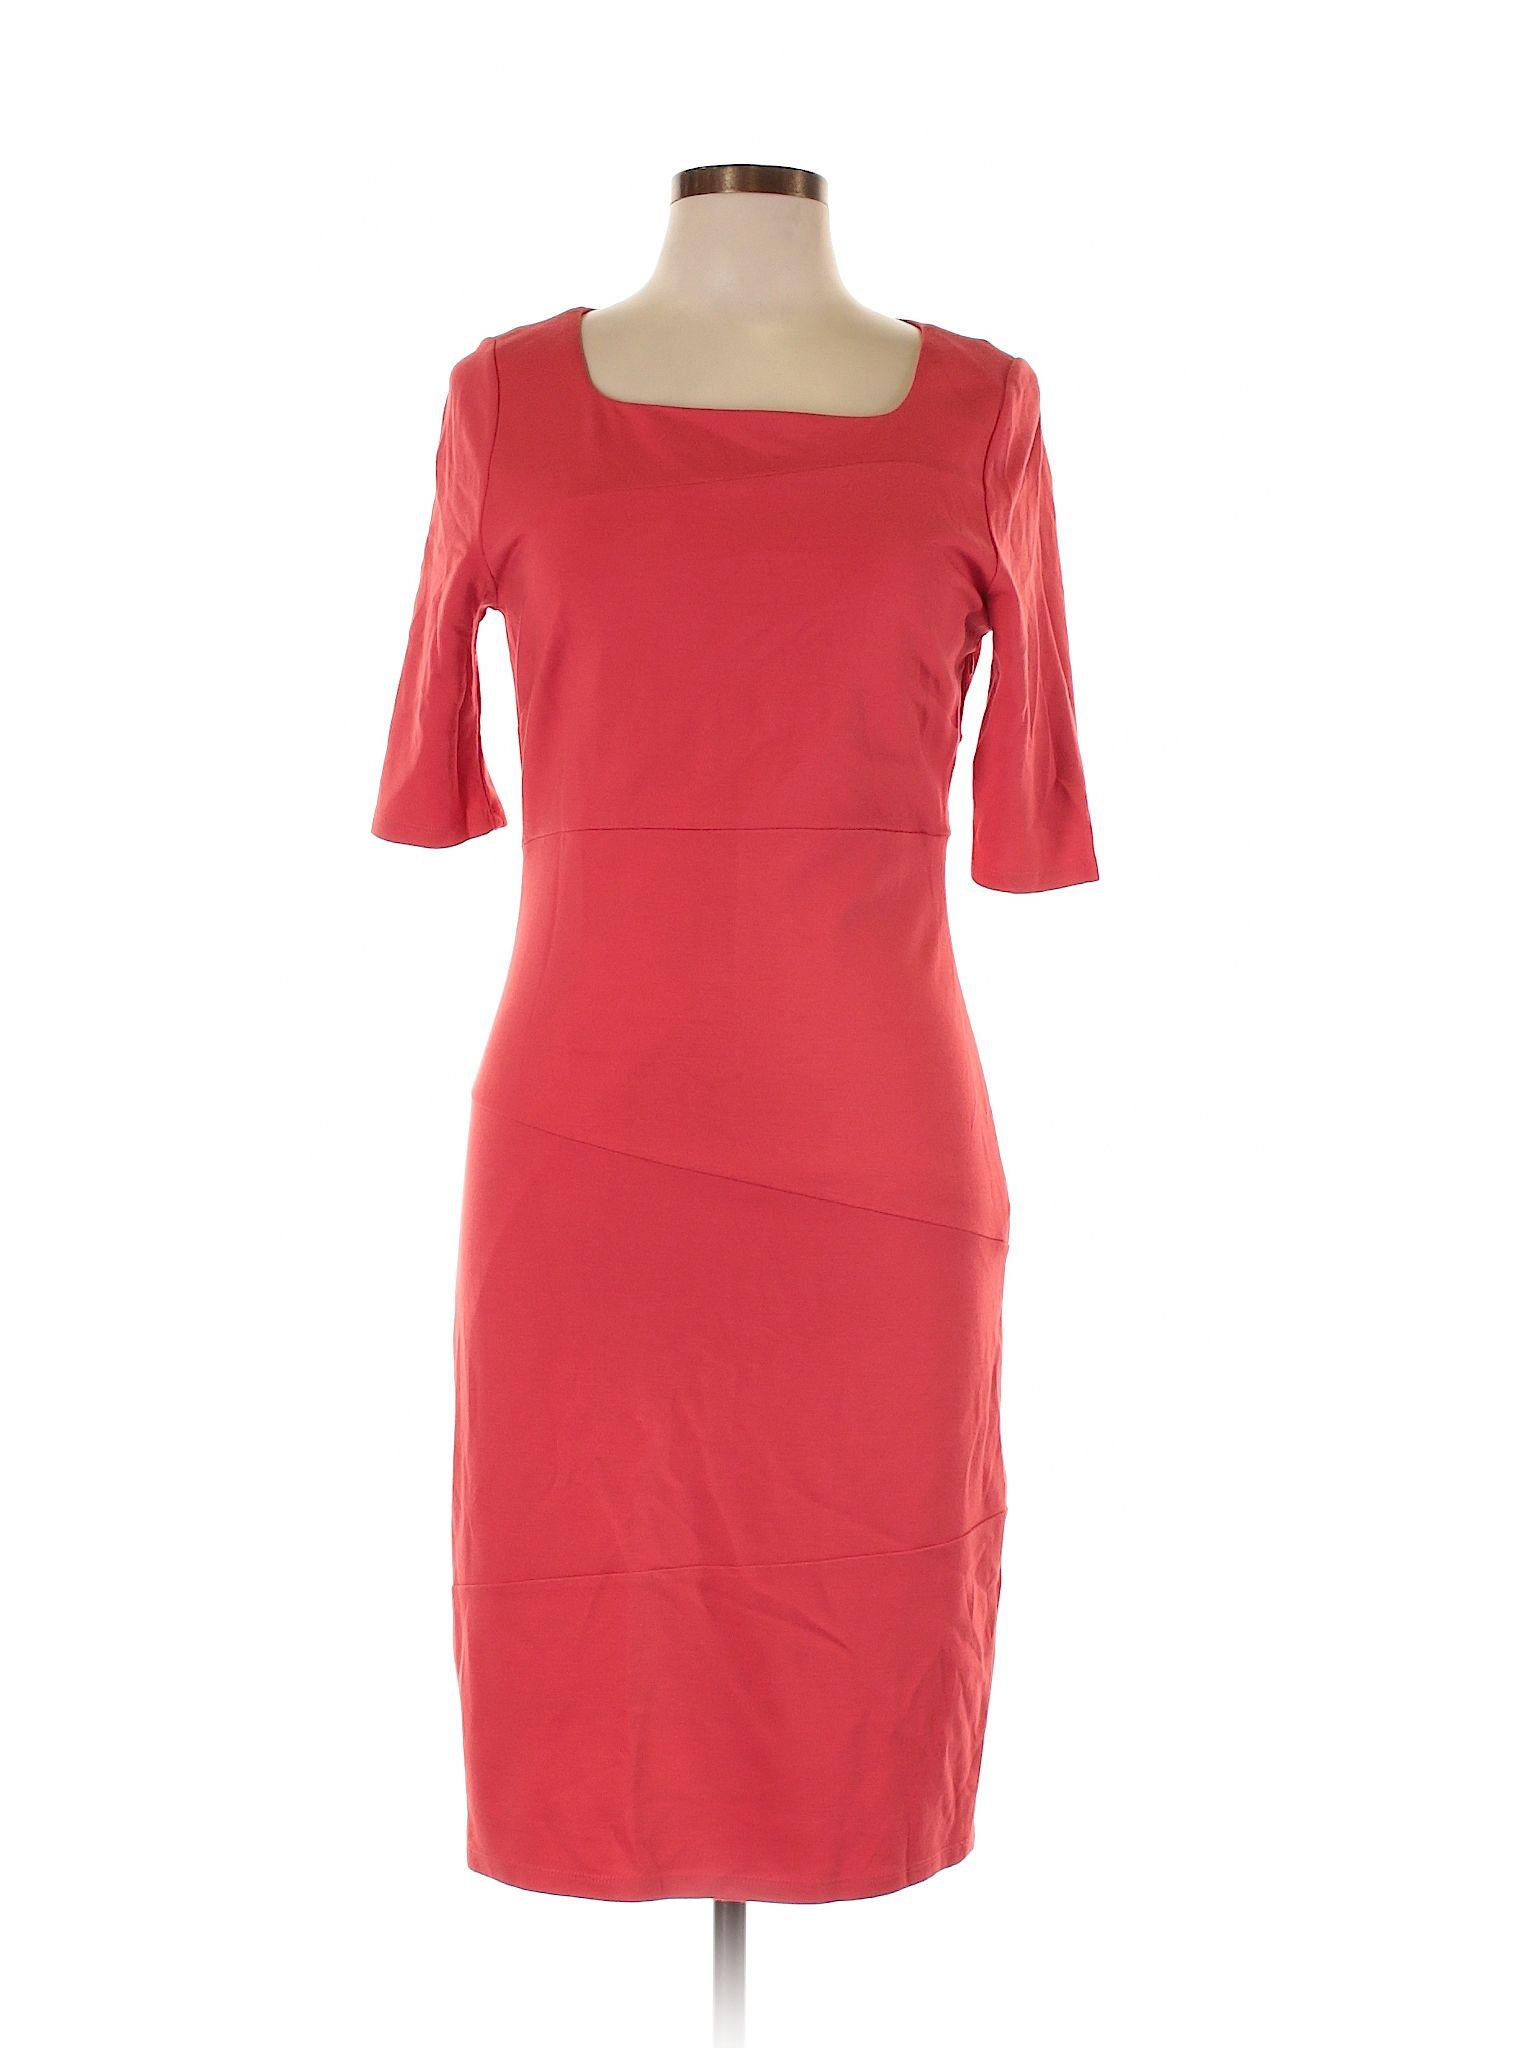 Lk Bennett Casual Dress Size 800 Coral Womens Dresses